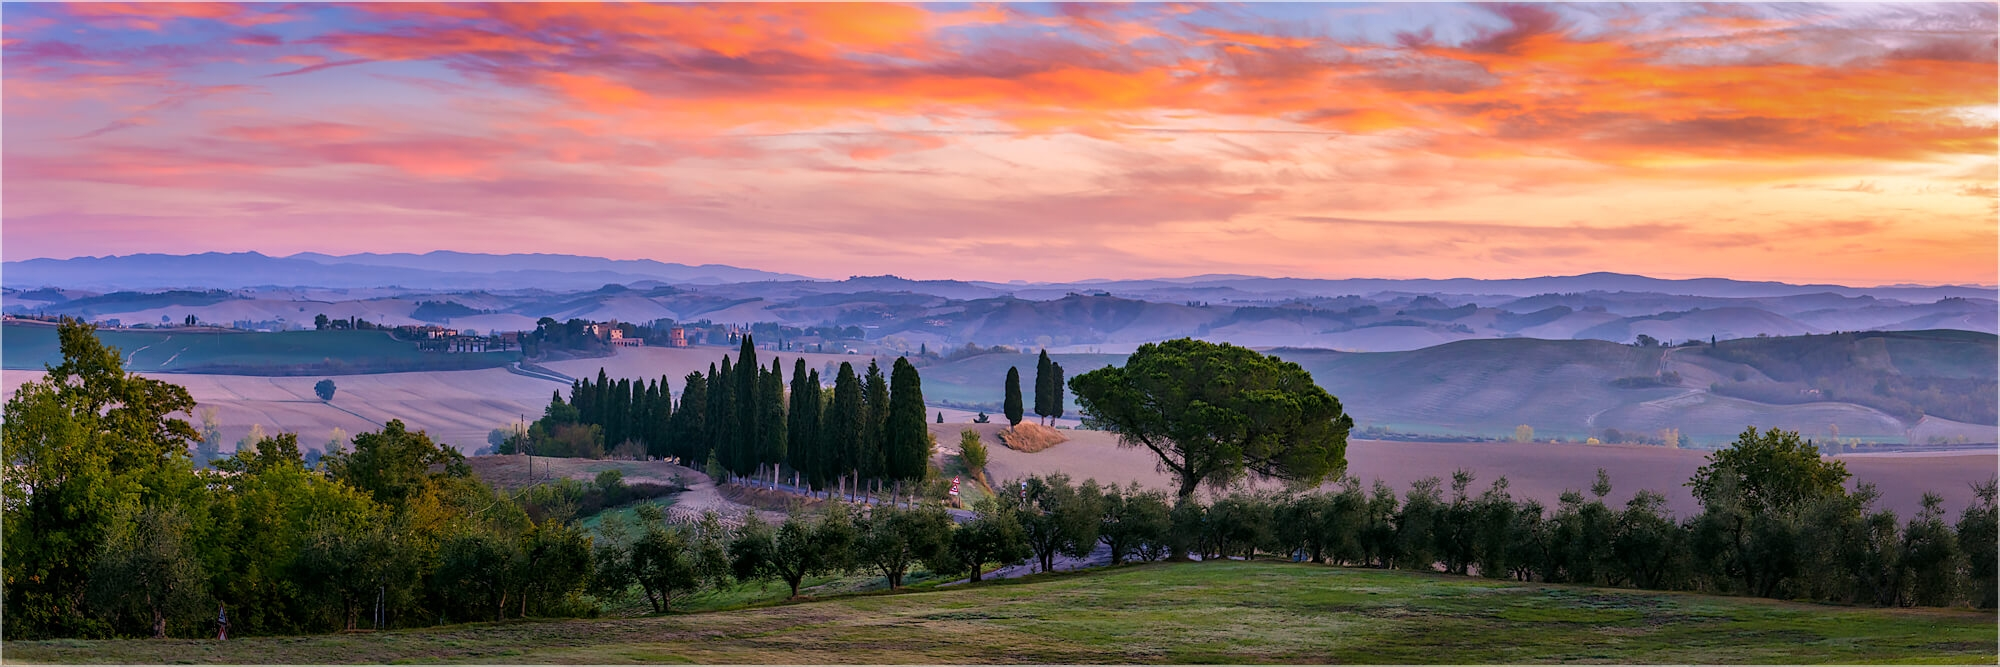 Panoramabild Morgenlicht in der Toskana Italien